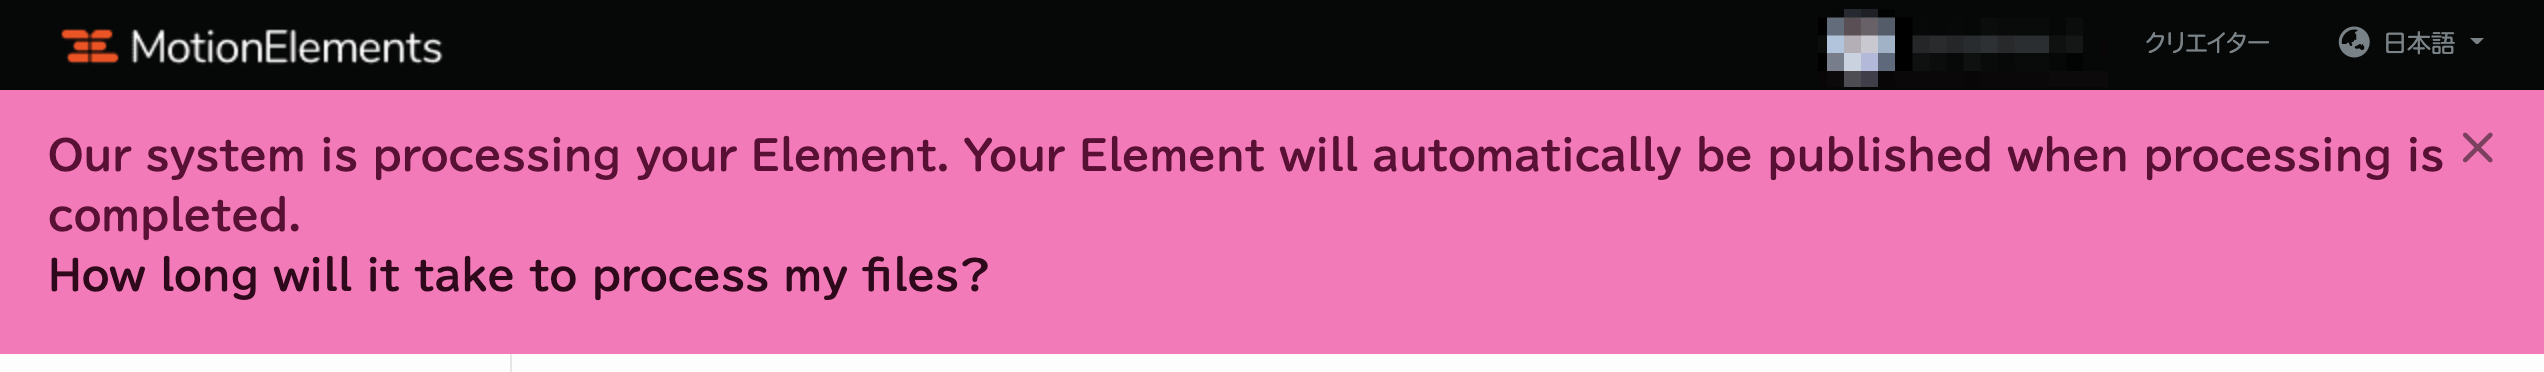 MotionElementsへの動画アップロード方法_10